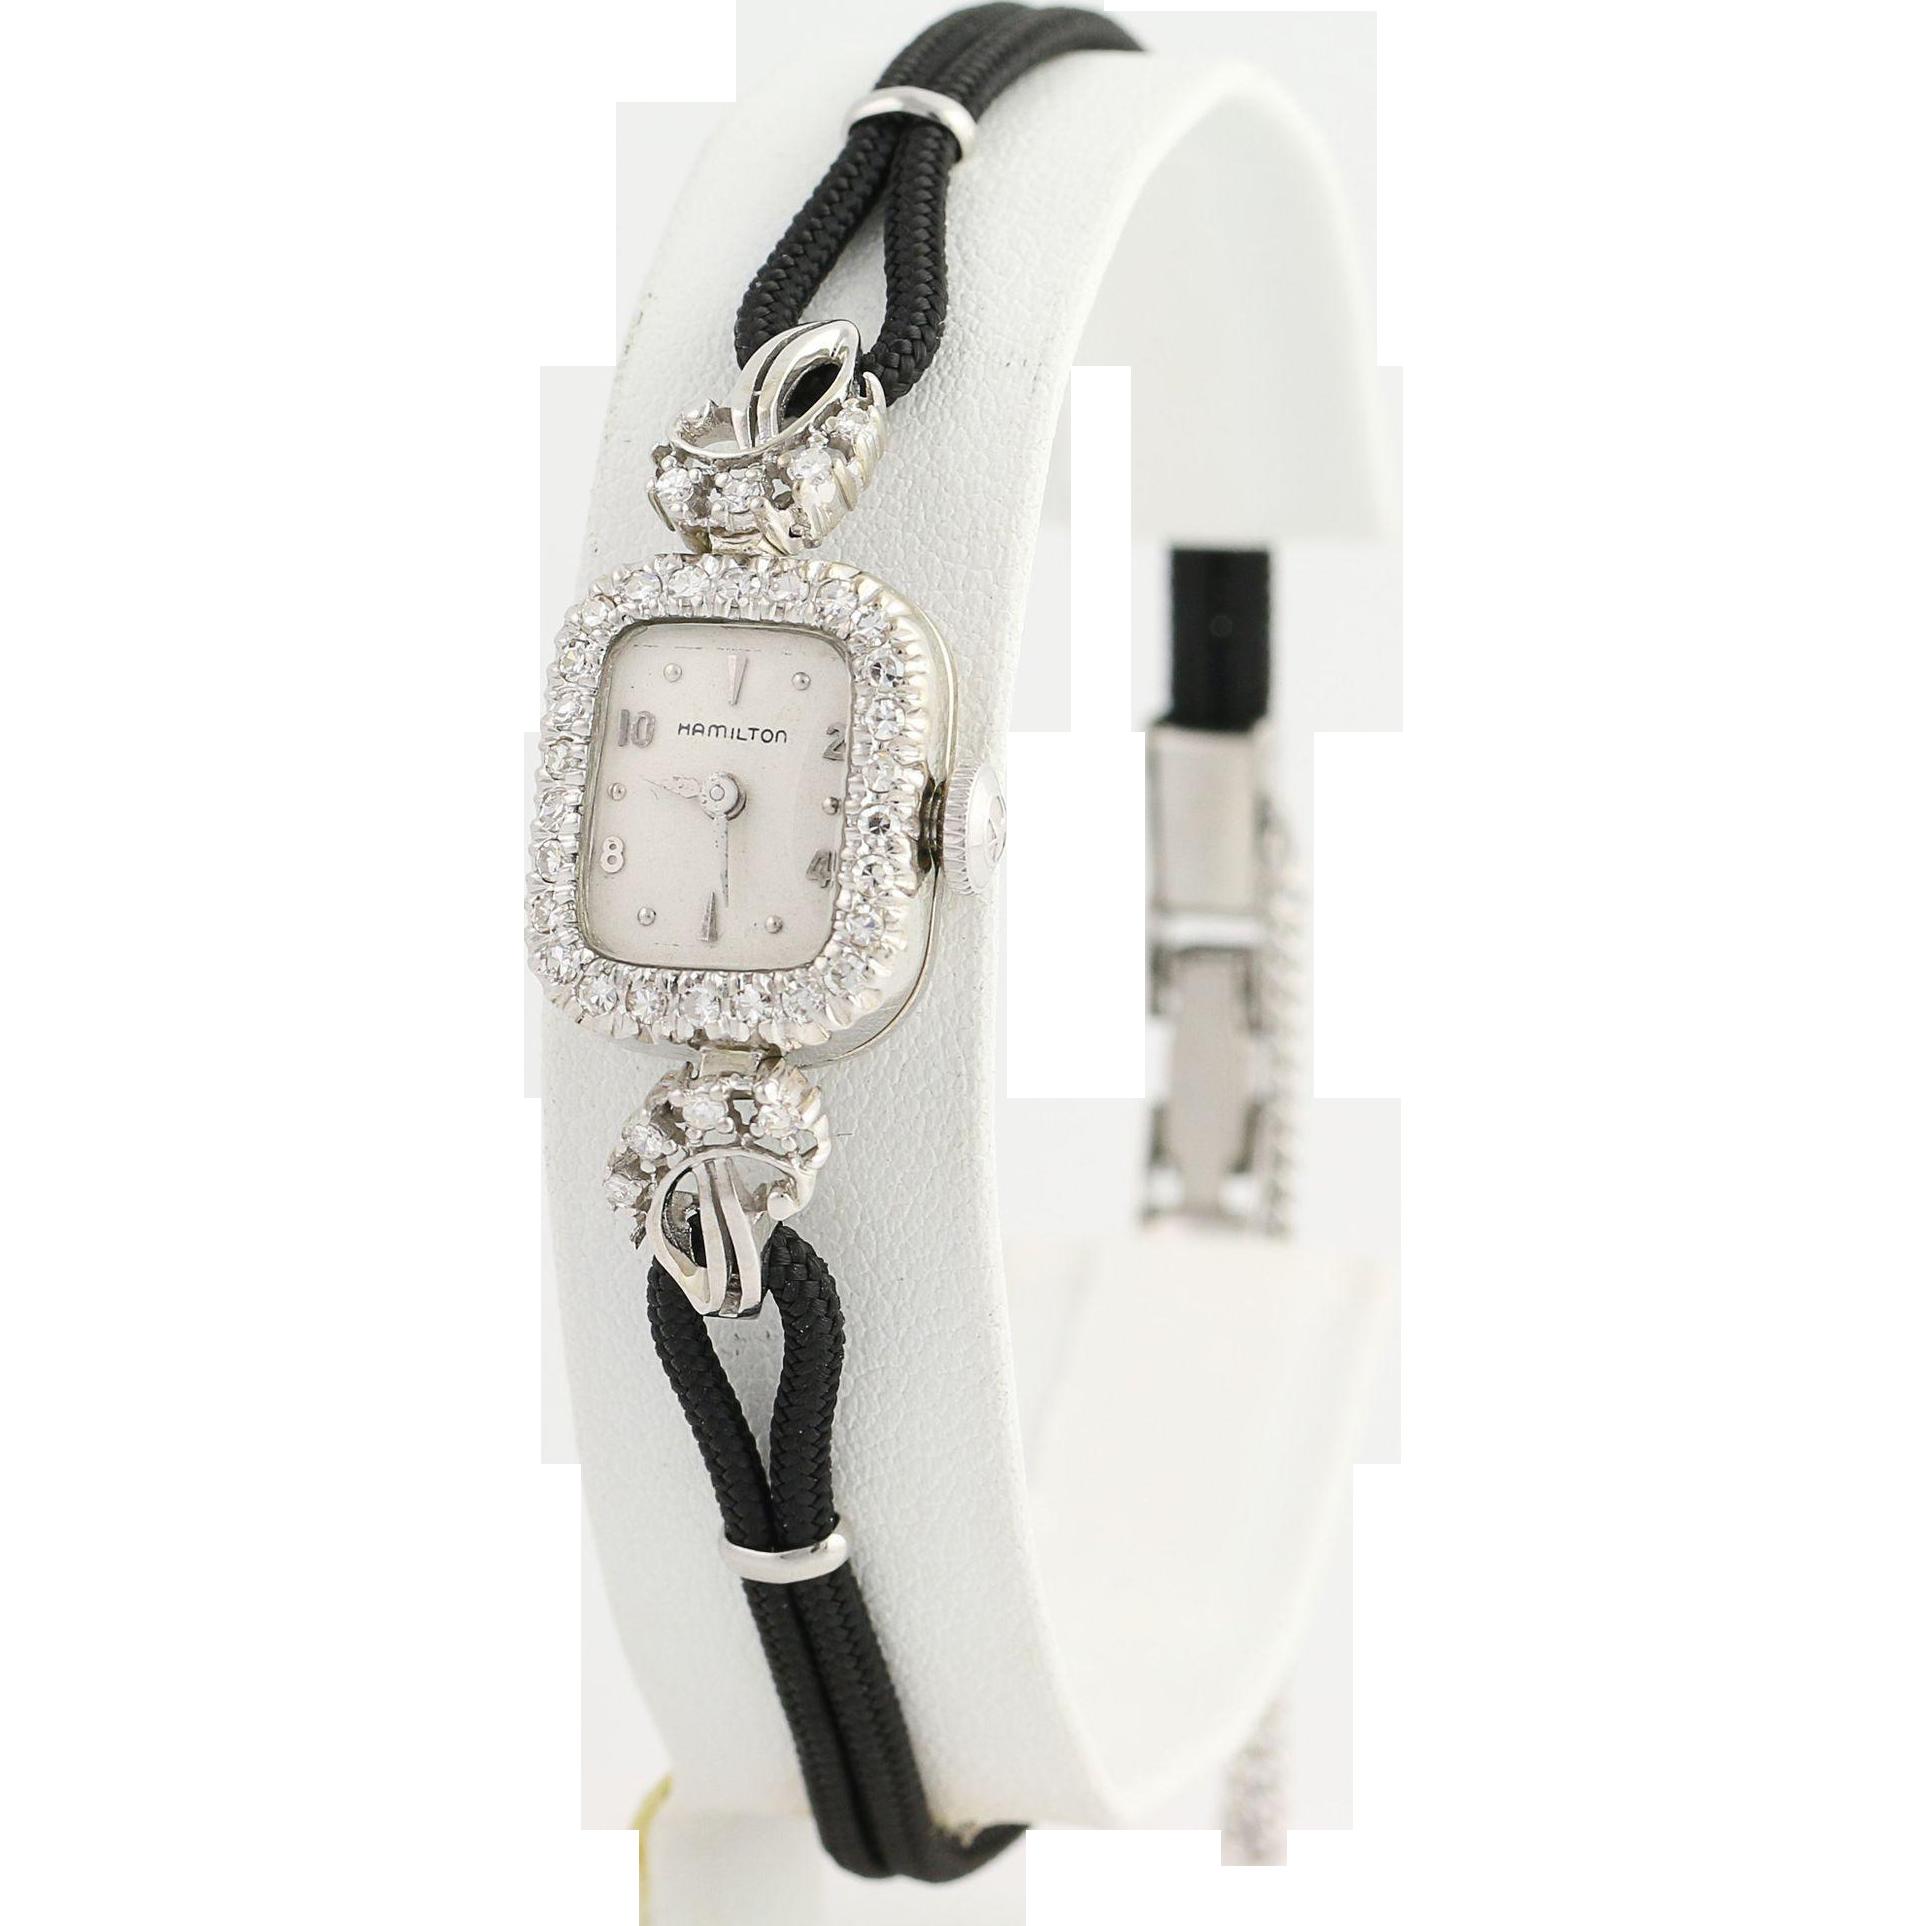 Vintage 1950s Hamilton Diamond Wristwatch - 14k White Gold Mechanical .62ctw